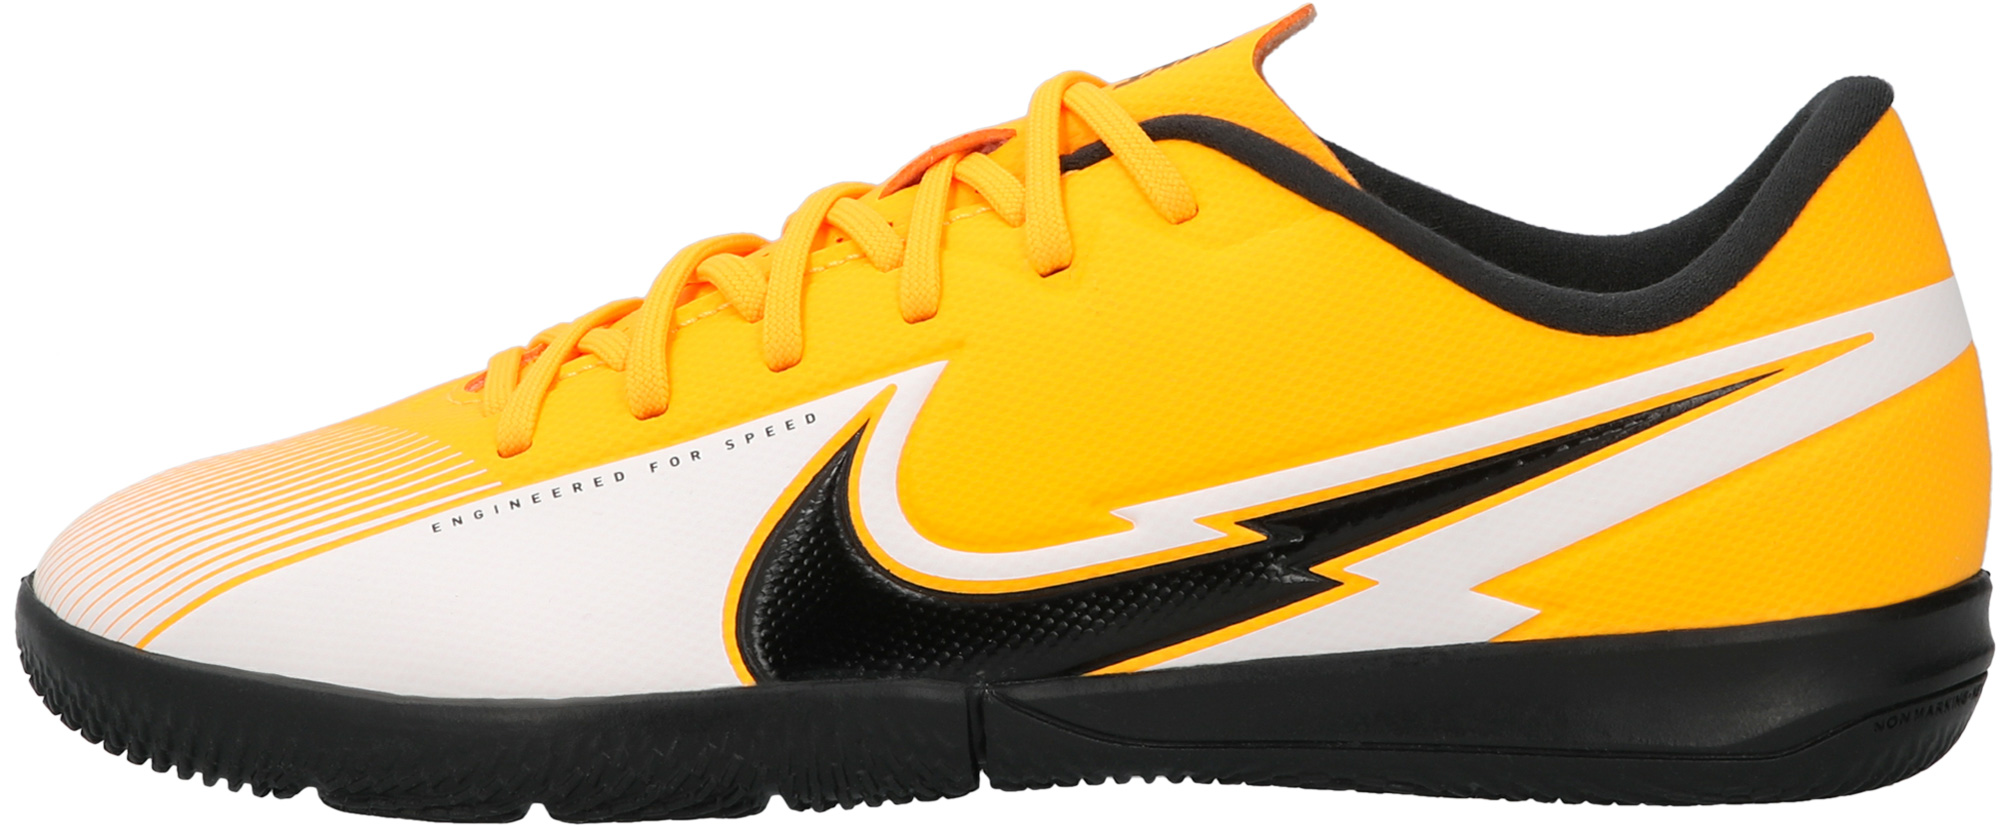 Nike Бутсы для мальчиков Nike Jr Vapor 13 Academy IC, размер 34.5 nike бутсы мужские nike vapor 13 academy ic размер 41